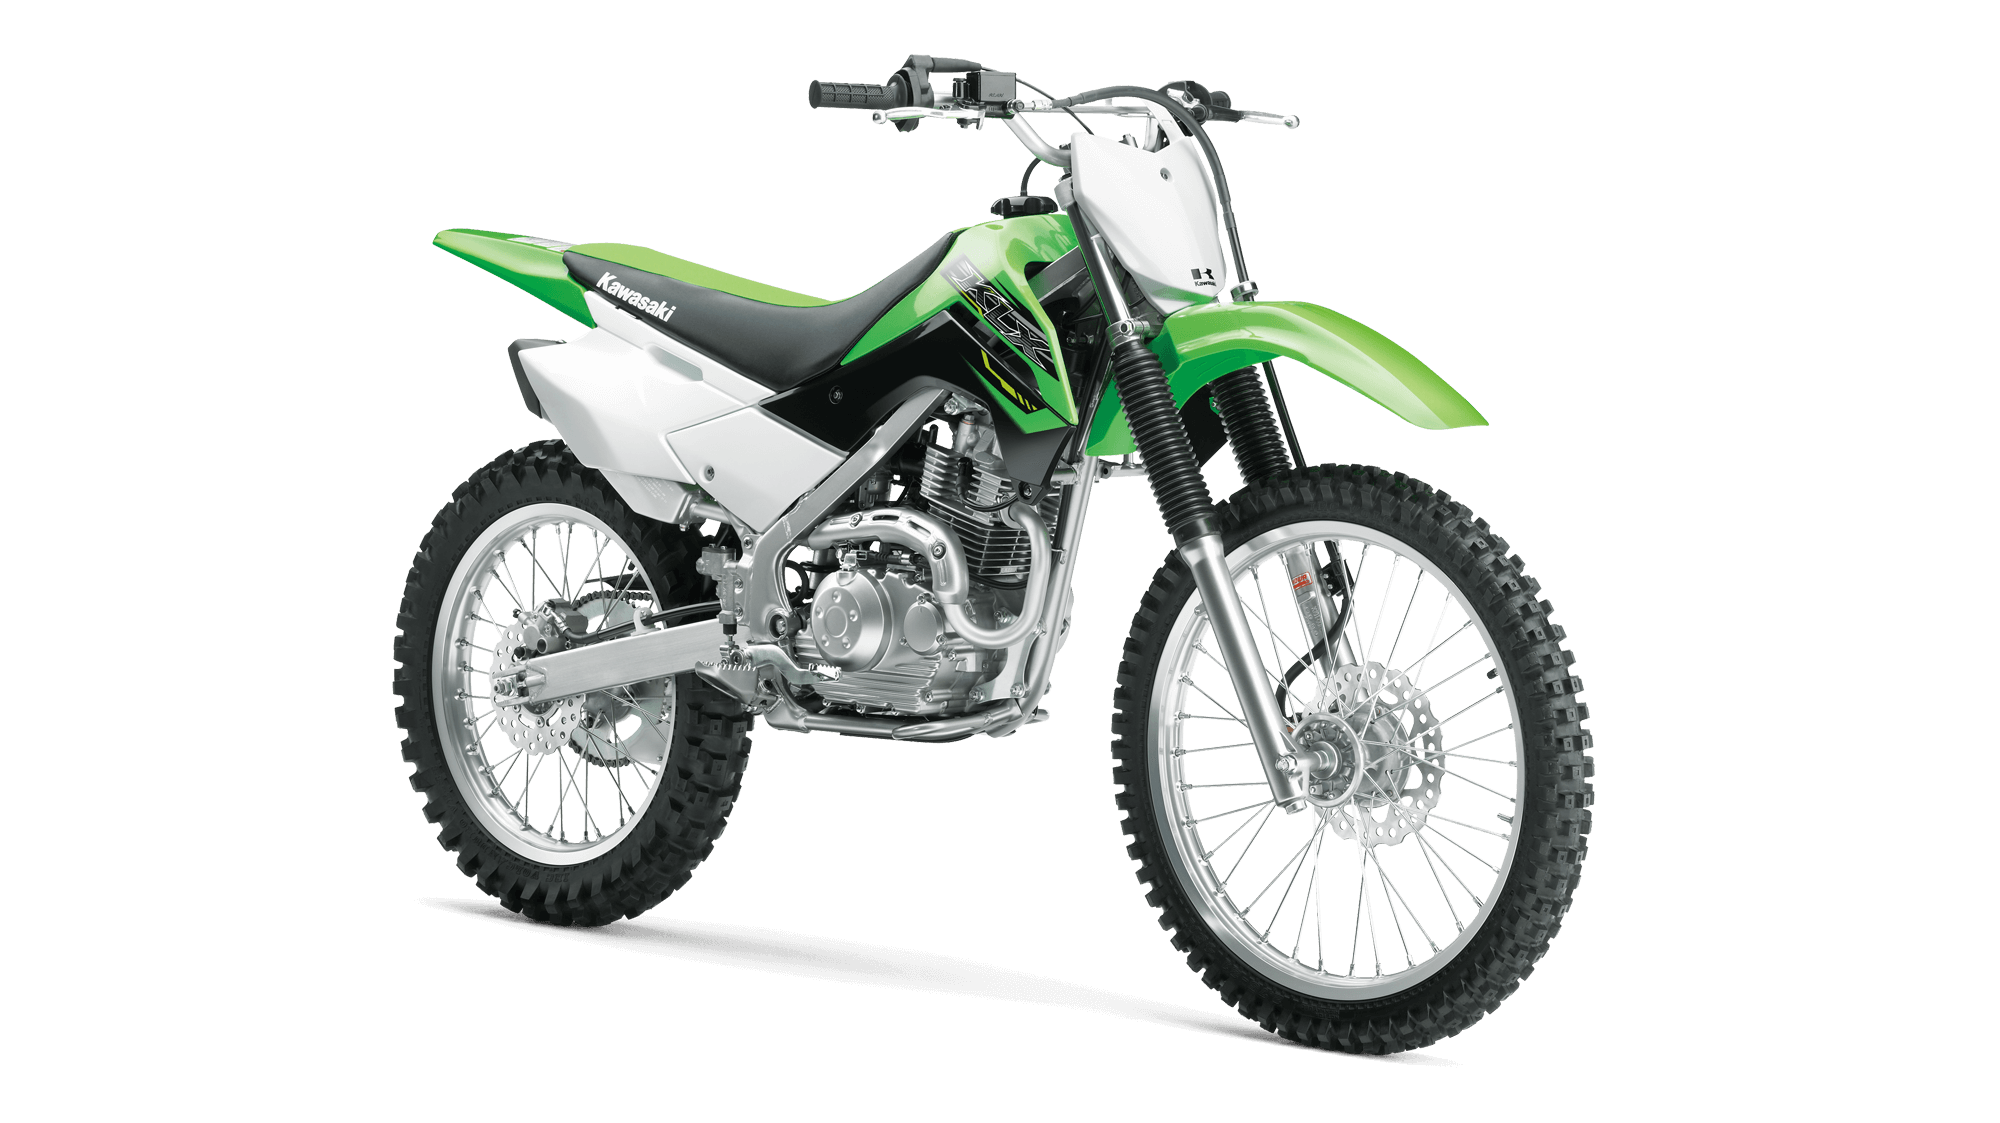 Klx 140g Klr Klx Motorcycle By Kawasaki